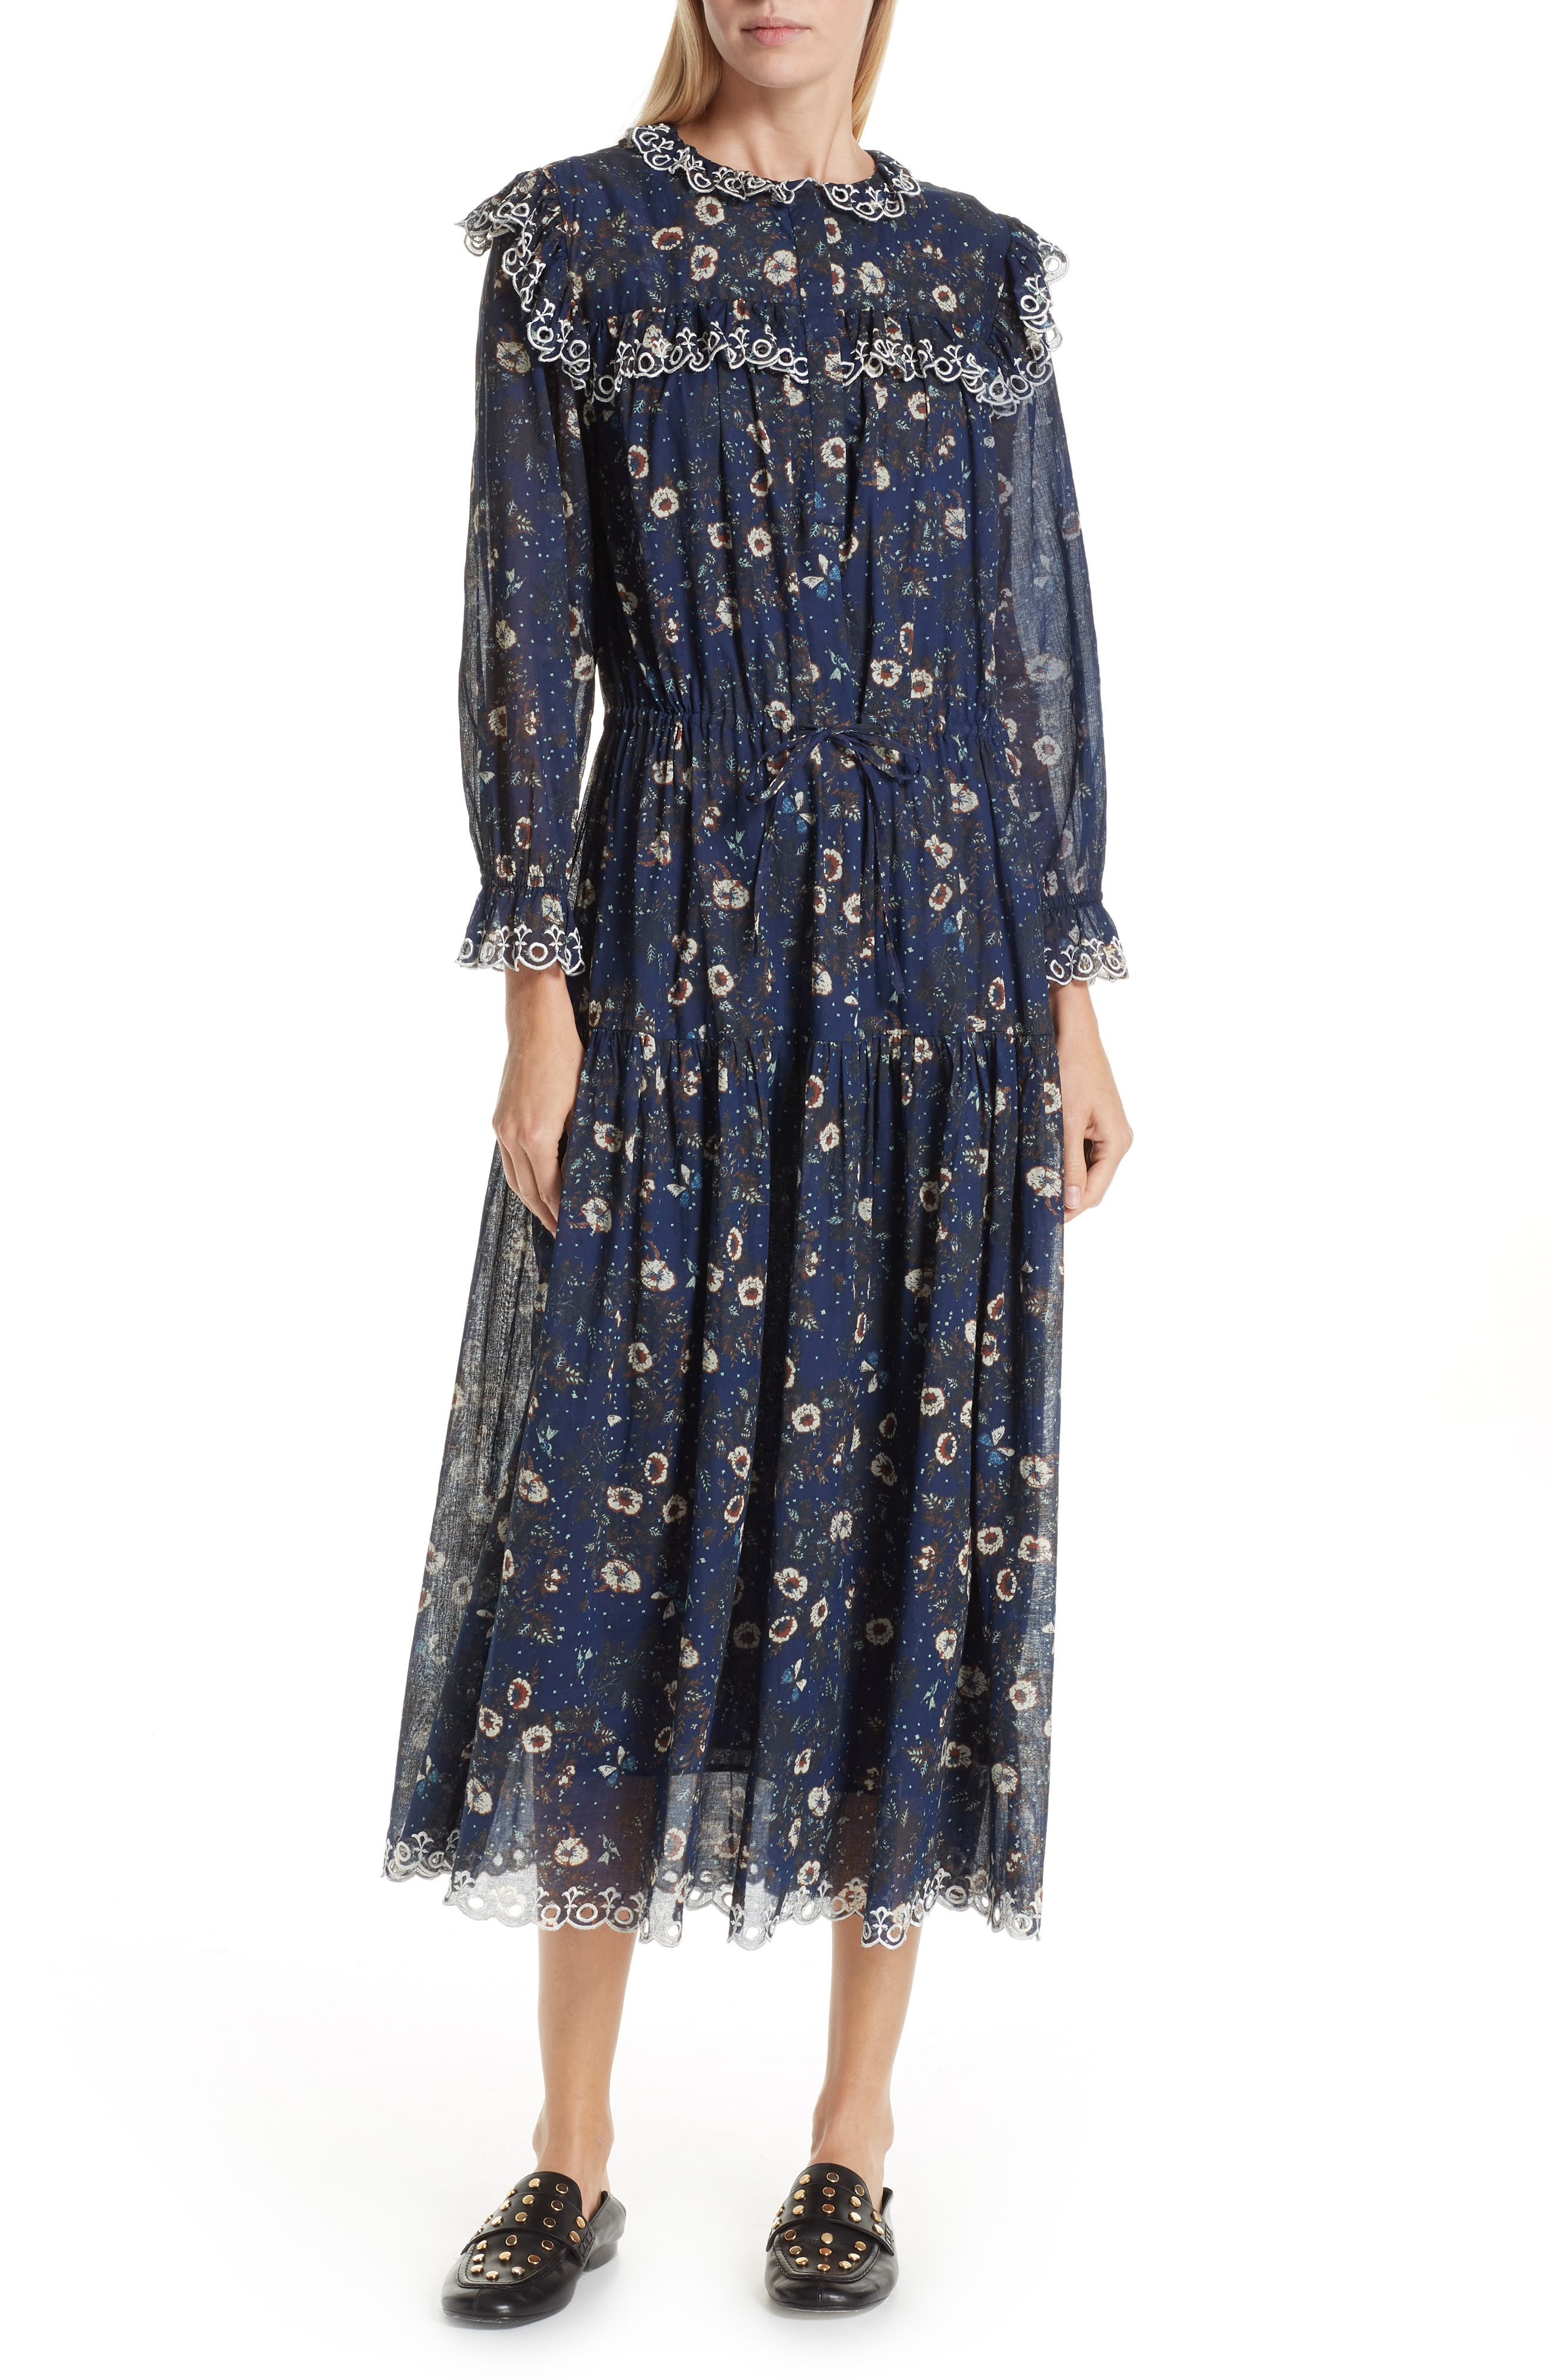 70s Dresses – Disco Dresses, Hippie Dresses, Wrap Dresses Womens Isabel Marant Etoile Eina Floral Print Midi Dress Size 12 US  44 FR - Blue $287.49 AT vintagedancer.com